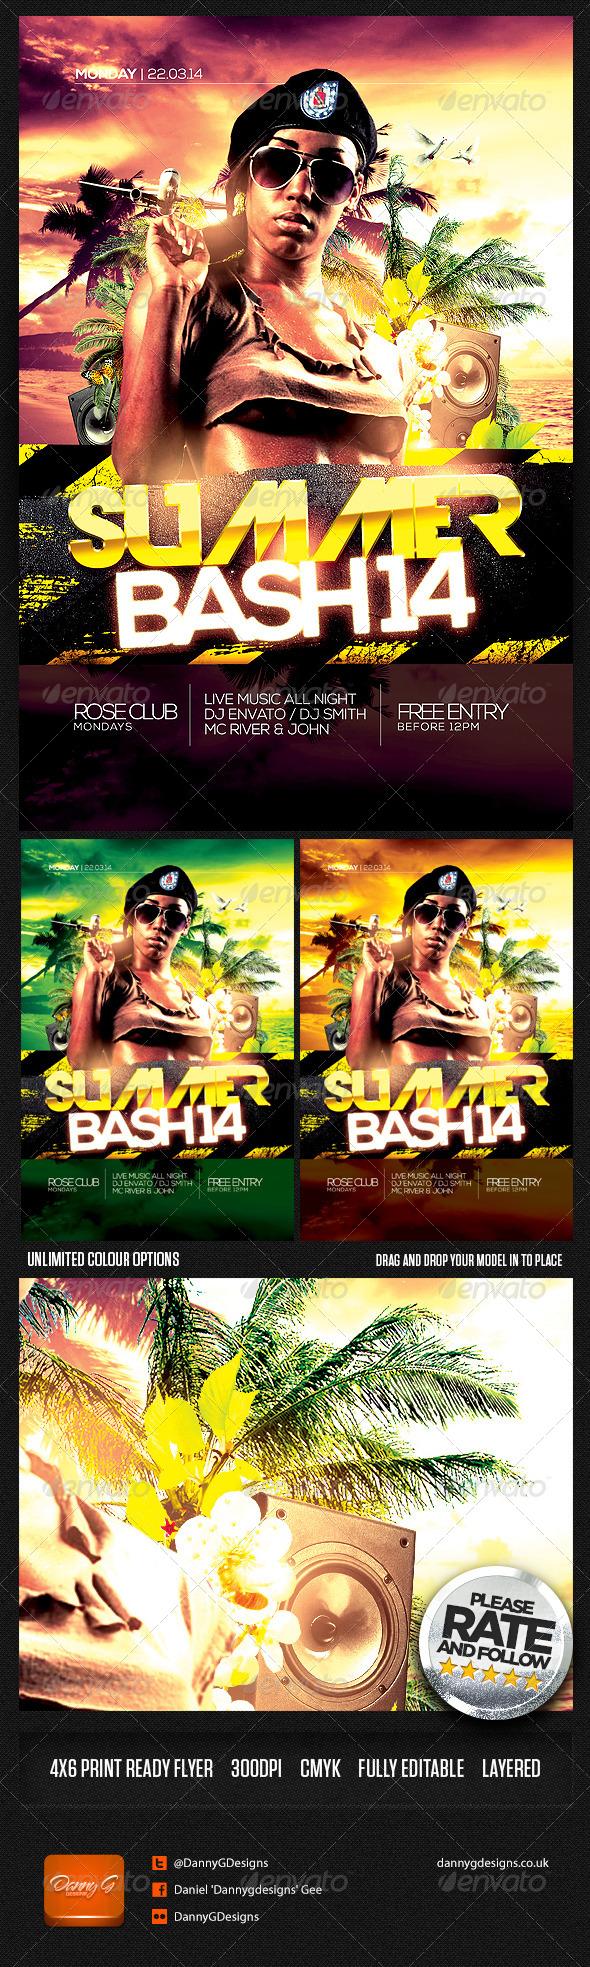 Summer Bash '14 Flyer Template PSD - Clubs & Parties Events